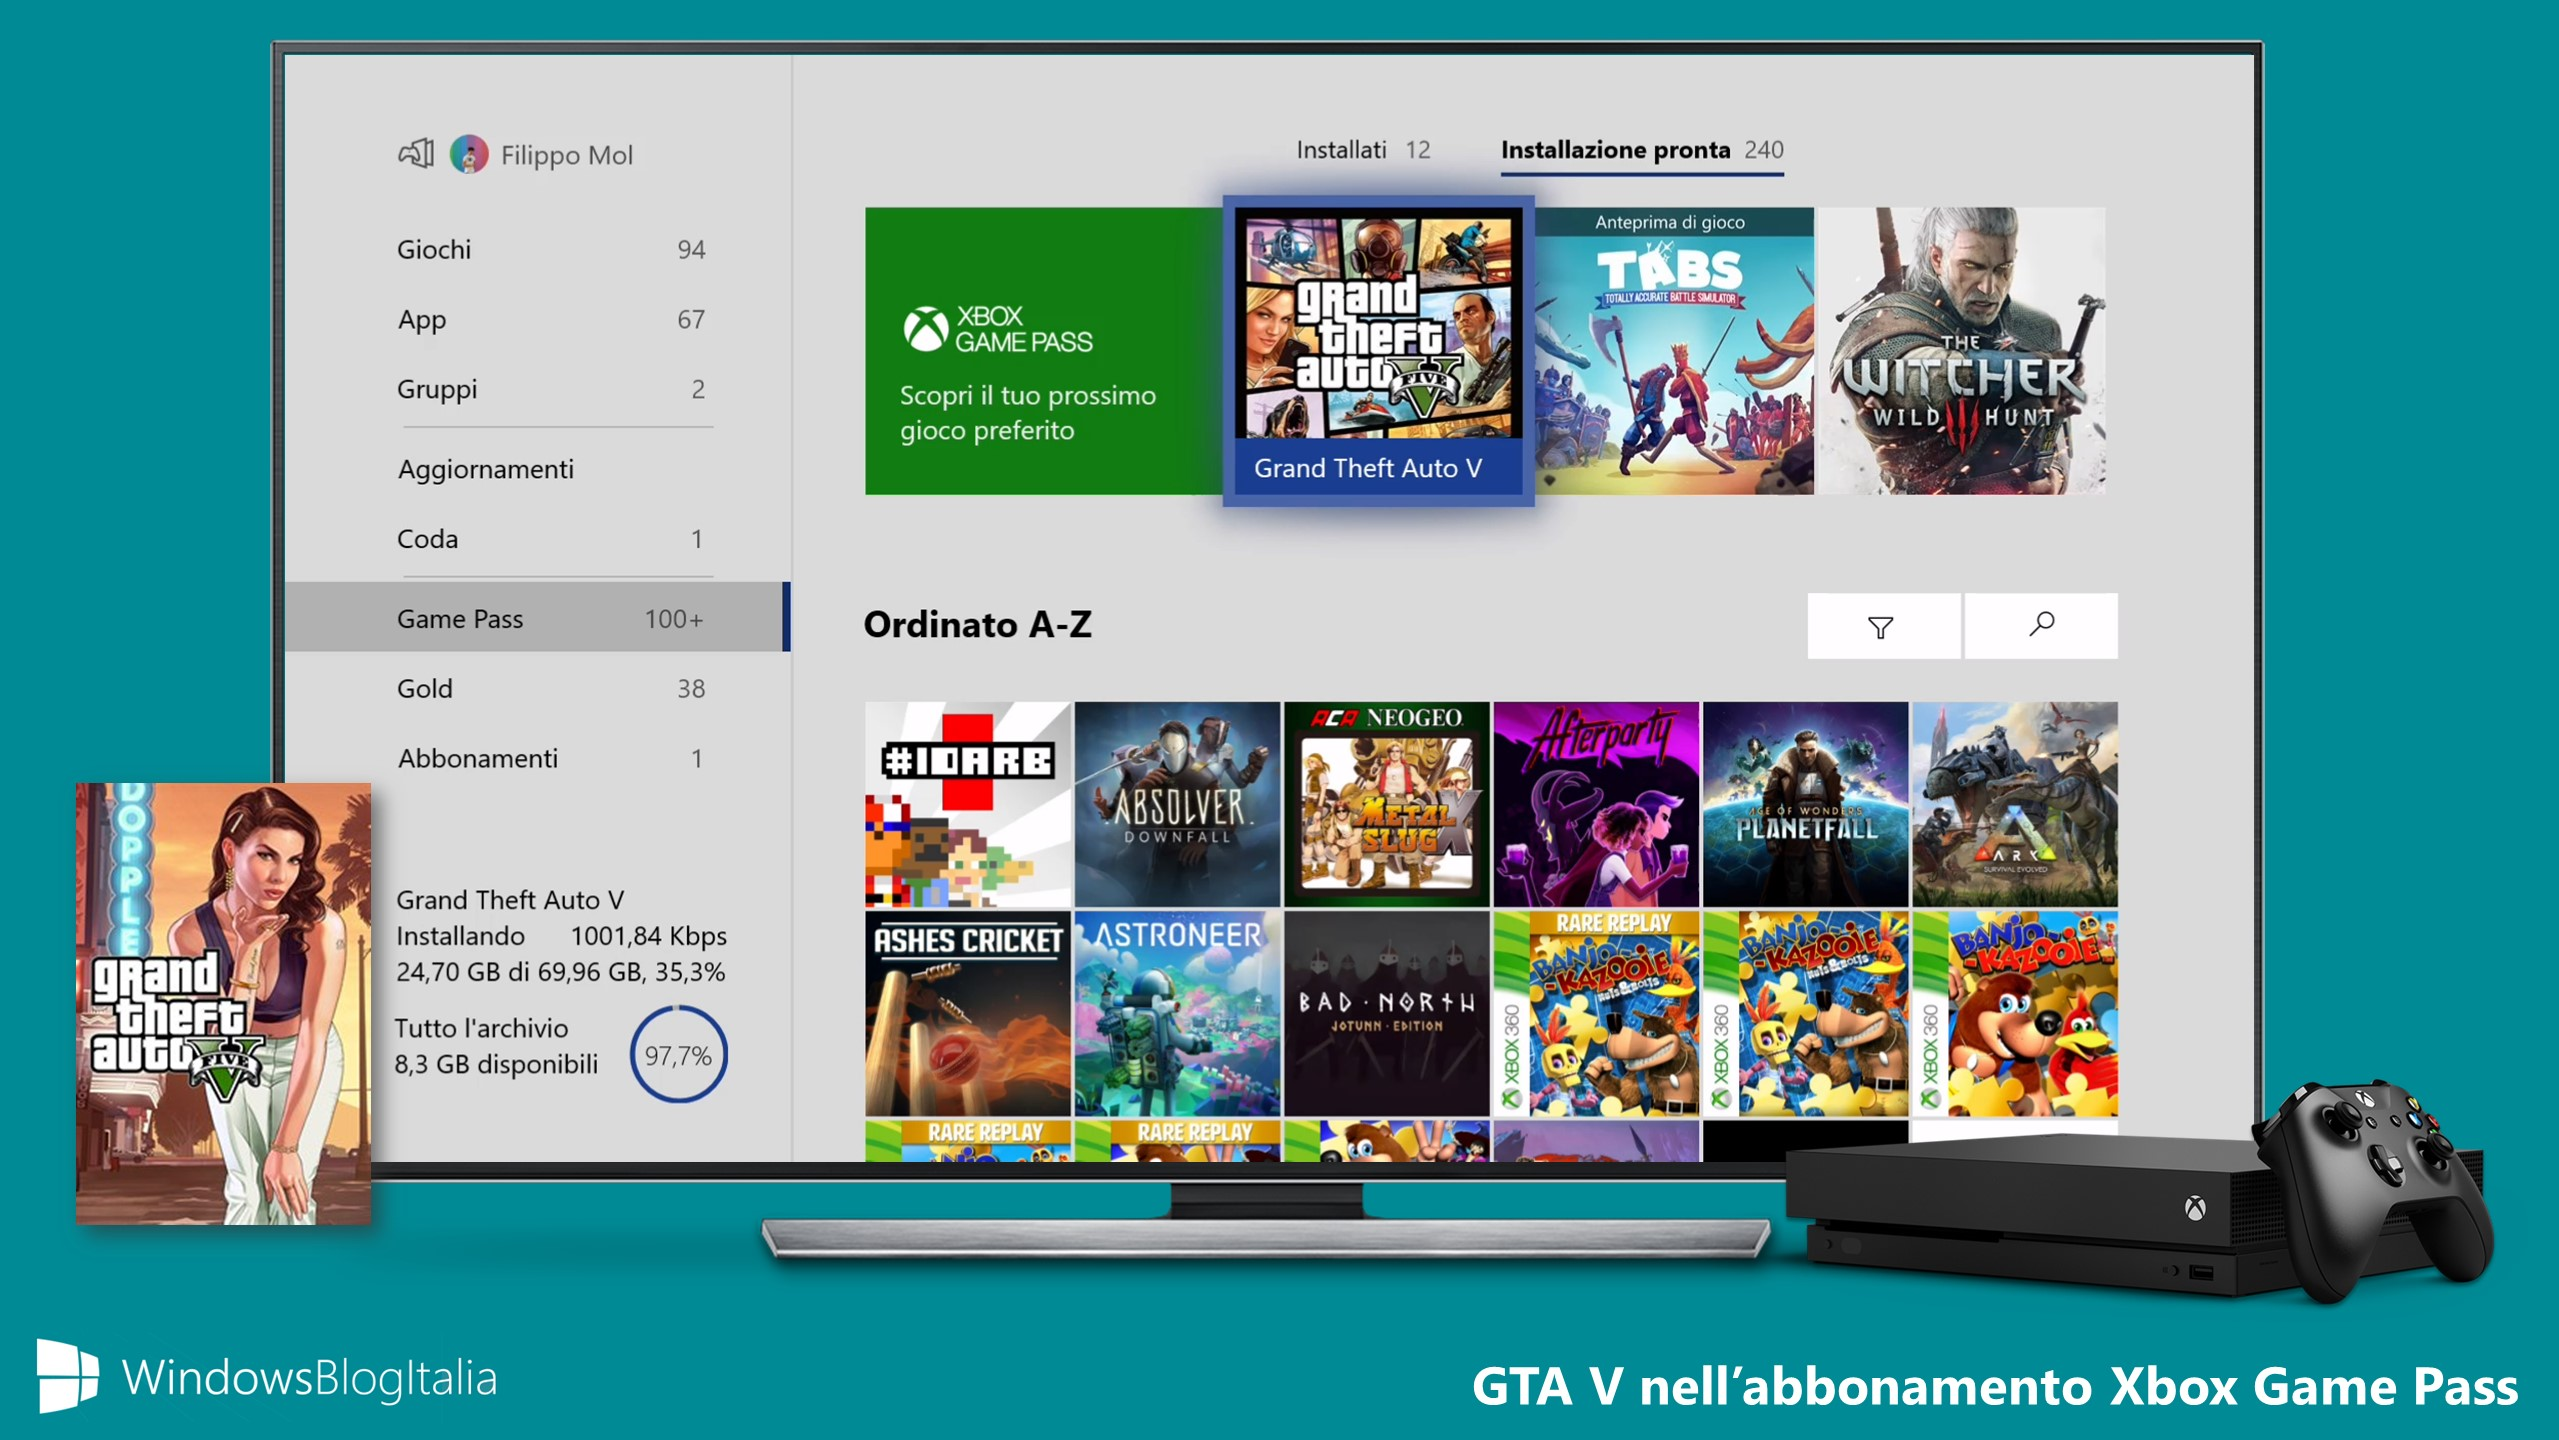 GTA V nell'abbonamento Xbox Game Pass